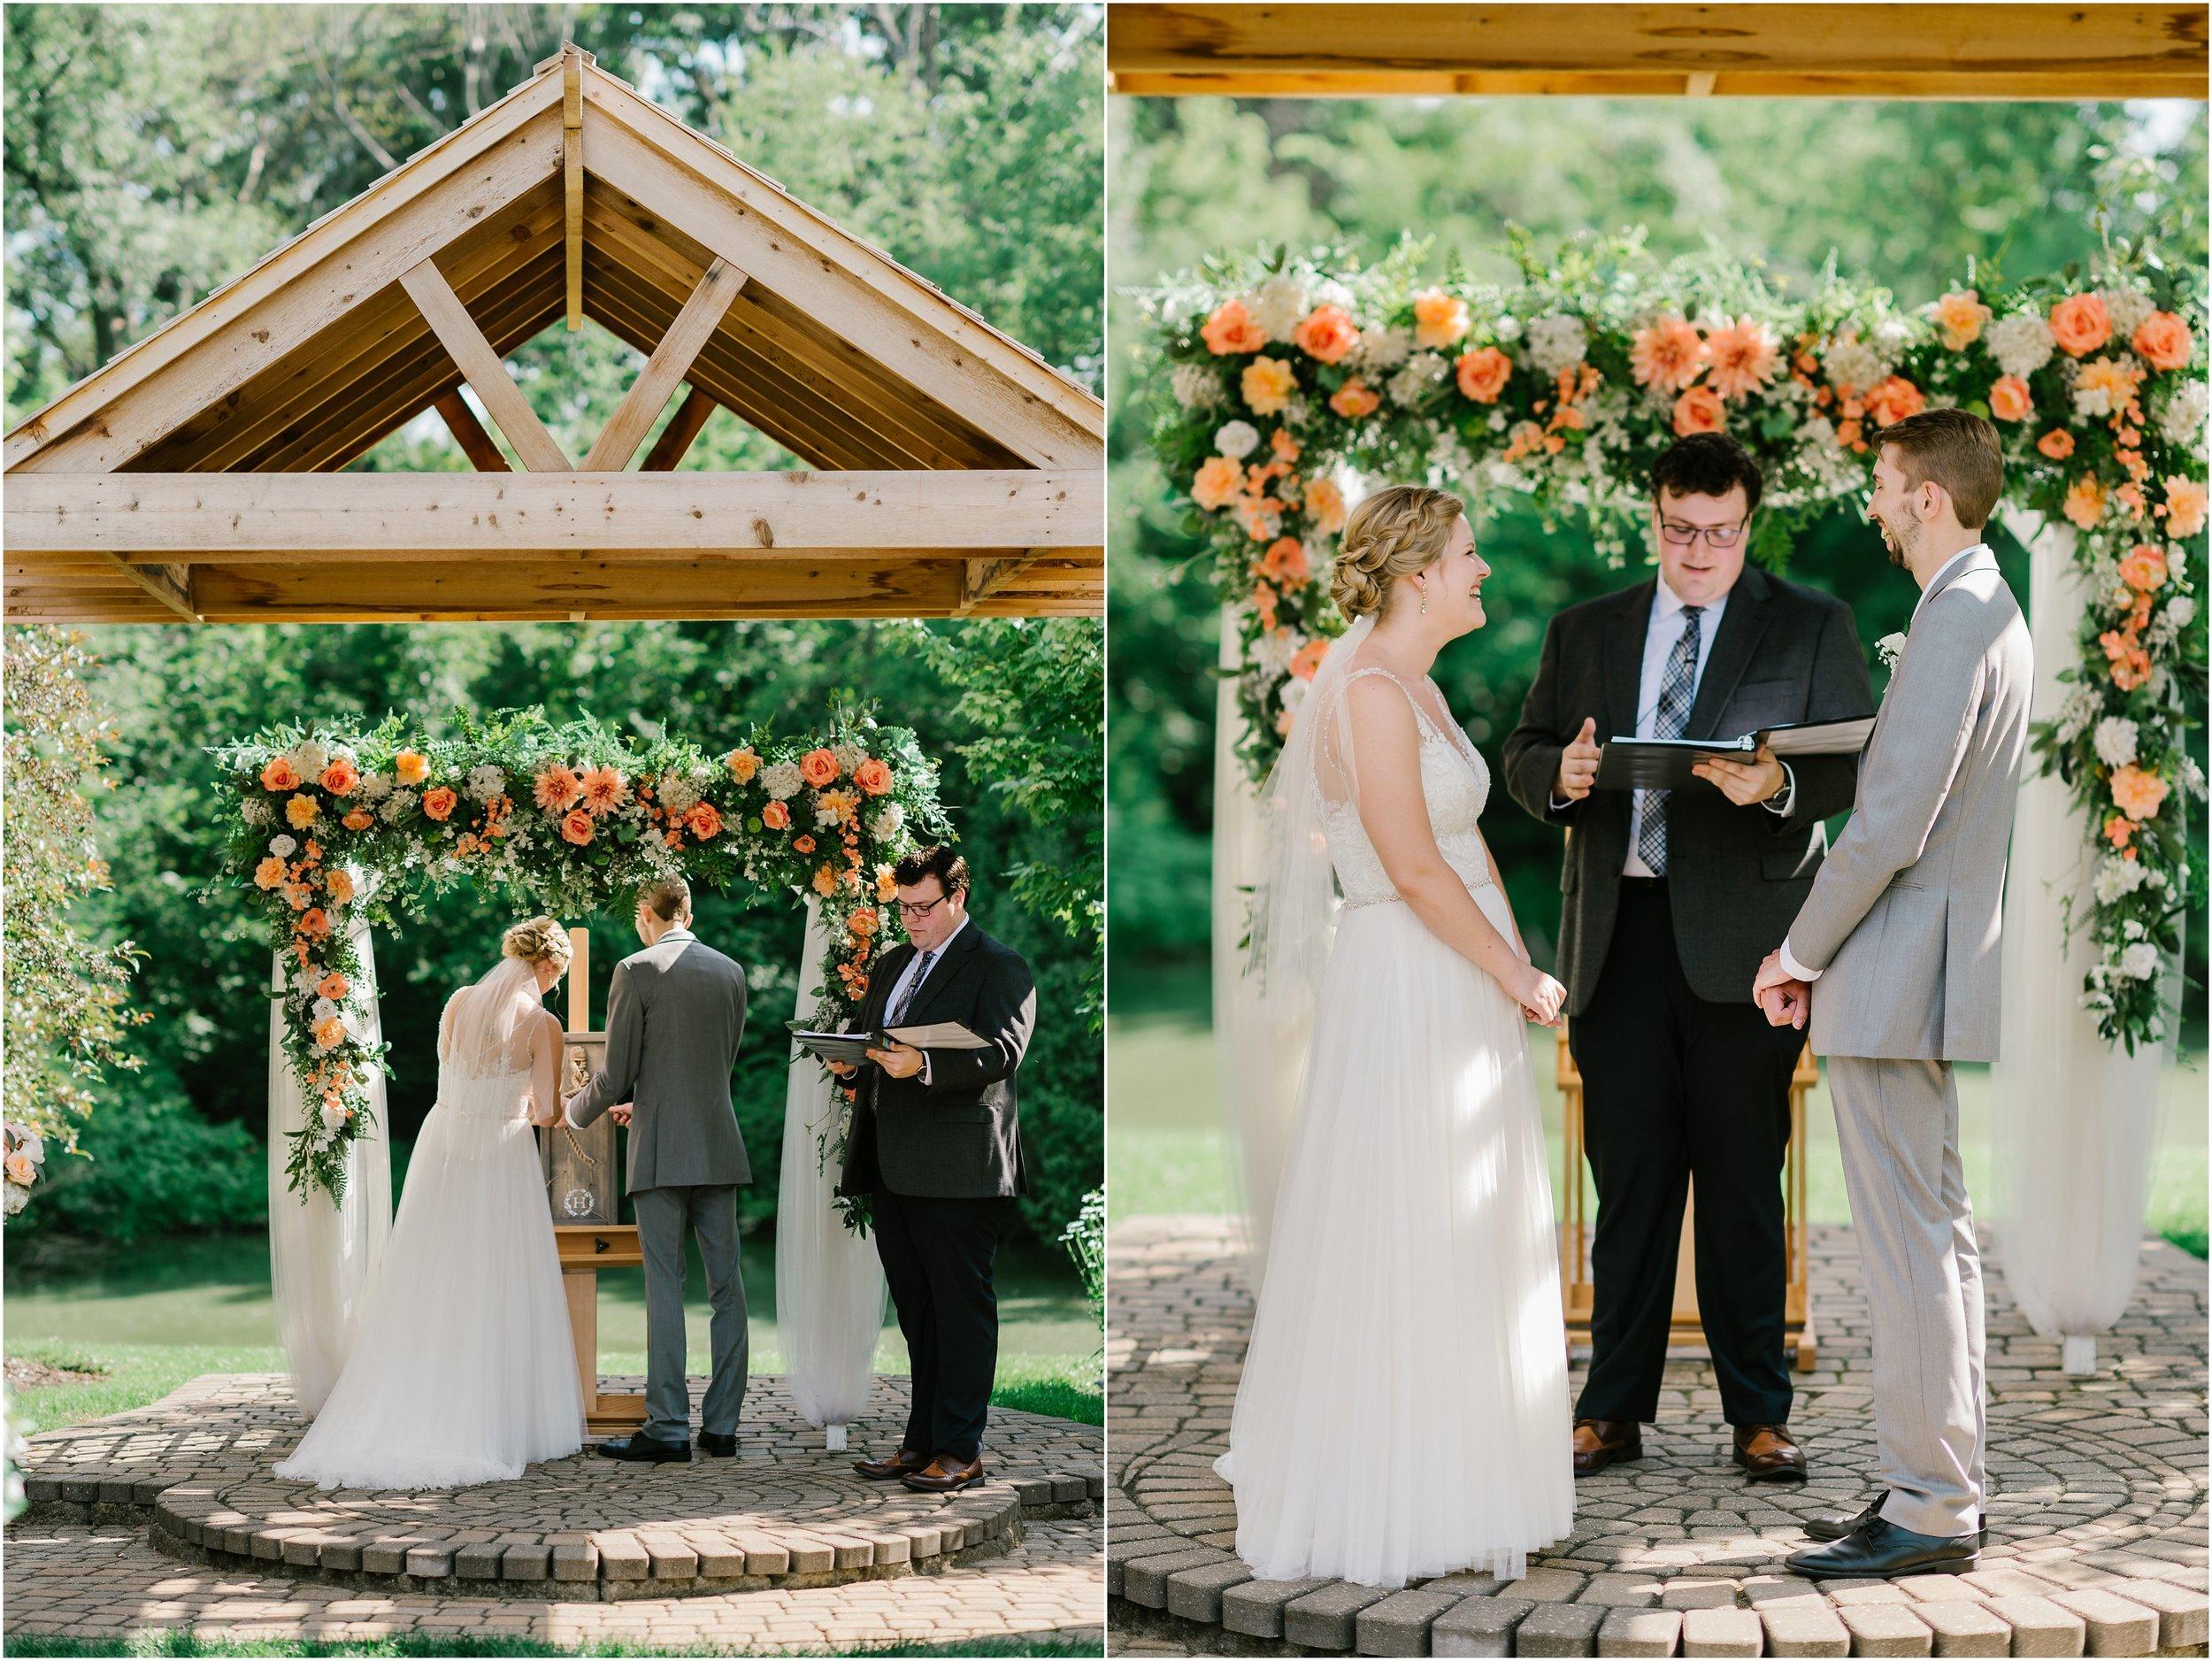 Rebecca_Shehorn_Photography_Indianapolis_Wedding_Photographer_8506.jpg